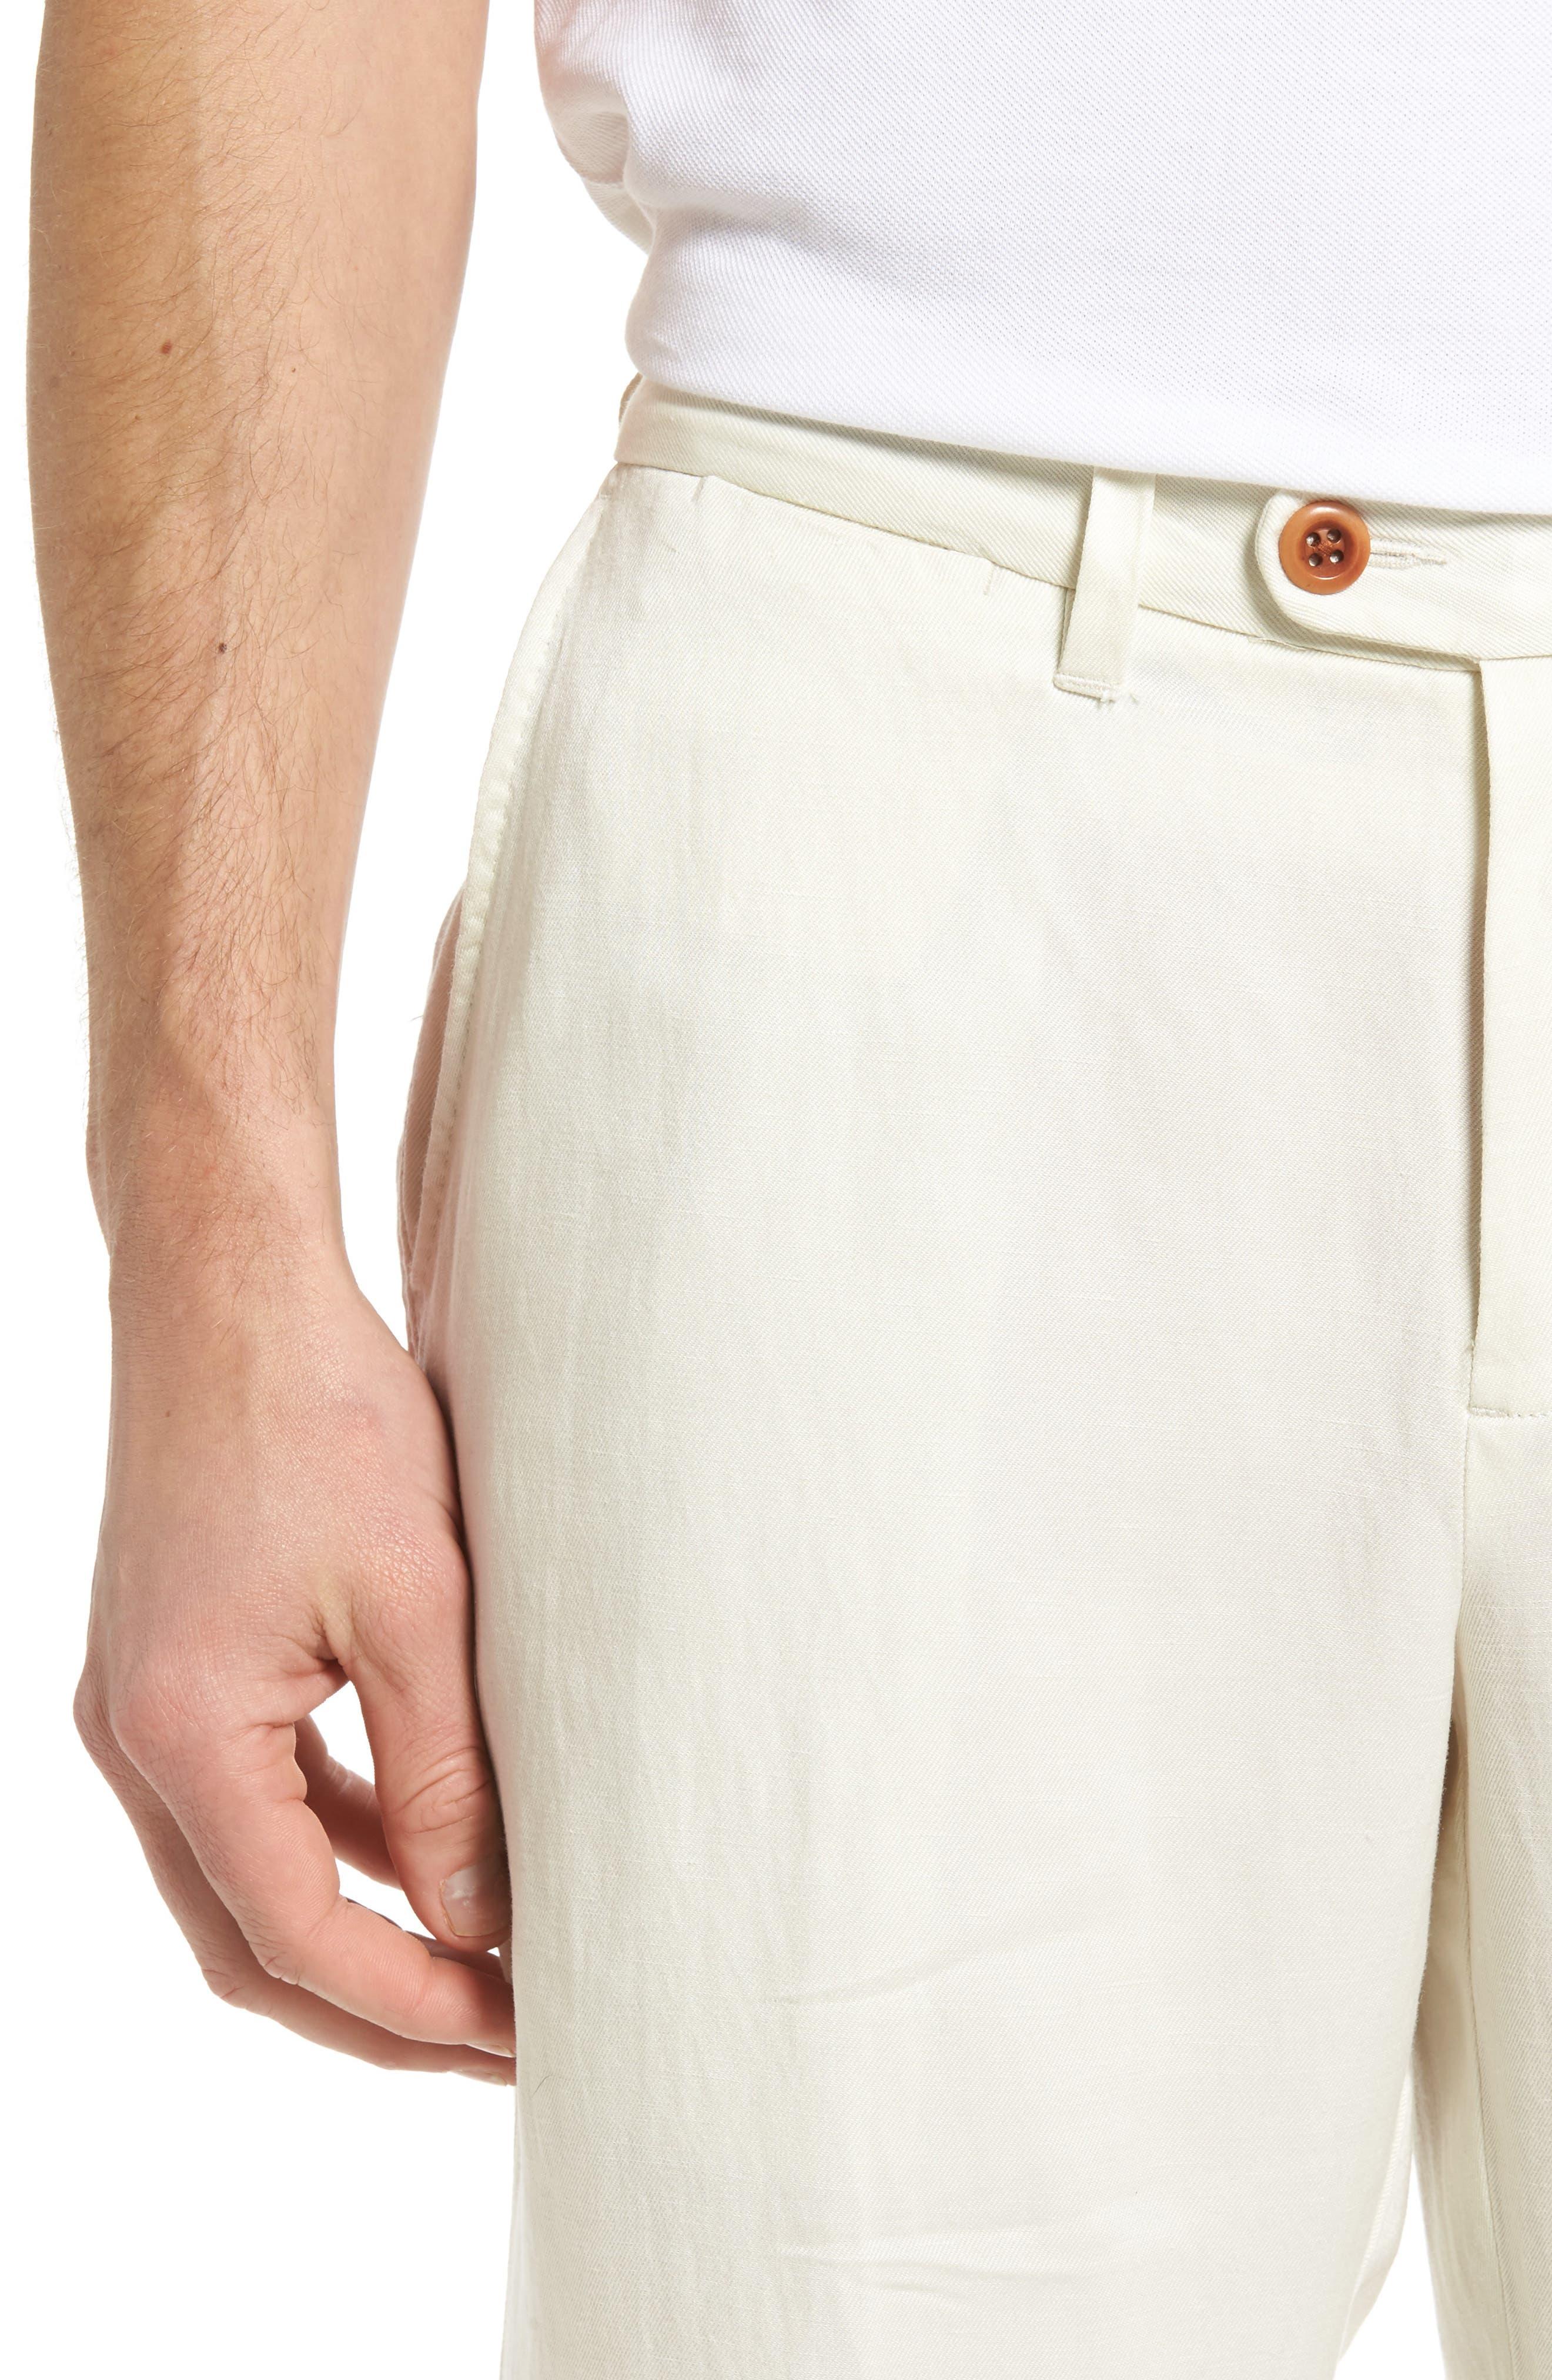 'La Jolla' Flat Front Pants,                             Alternate thumbnail 4, color,                             250